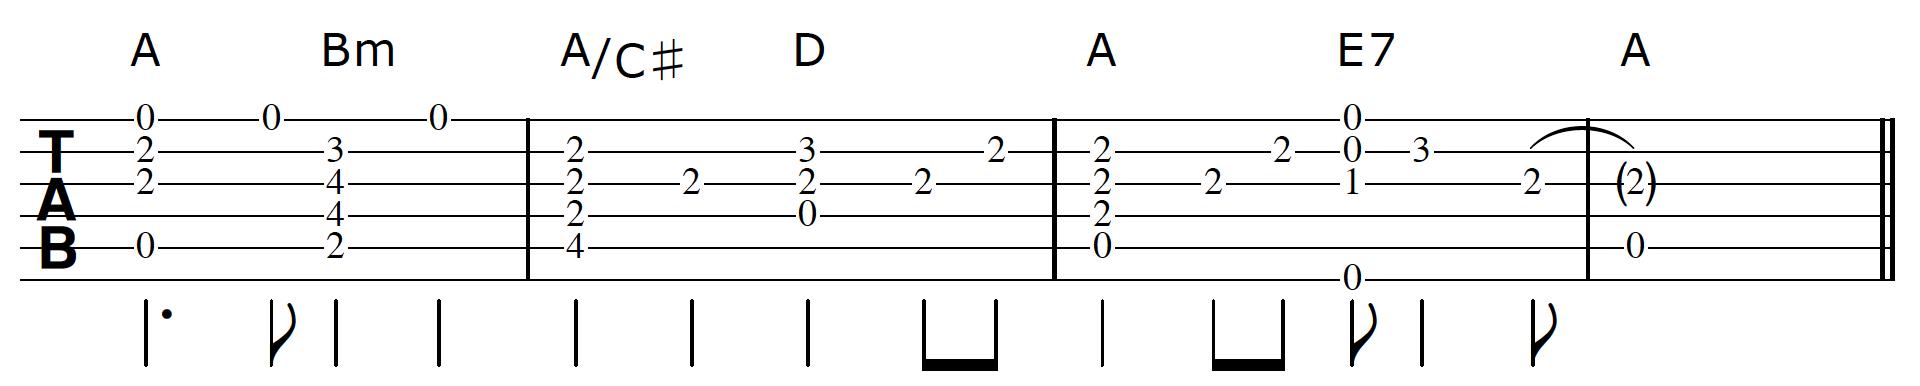 Parallel Key Modulation Arrangement 2